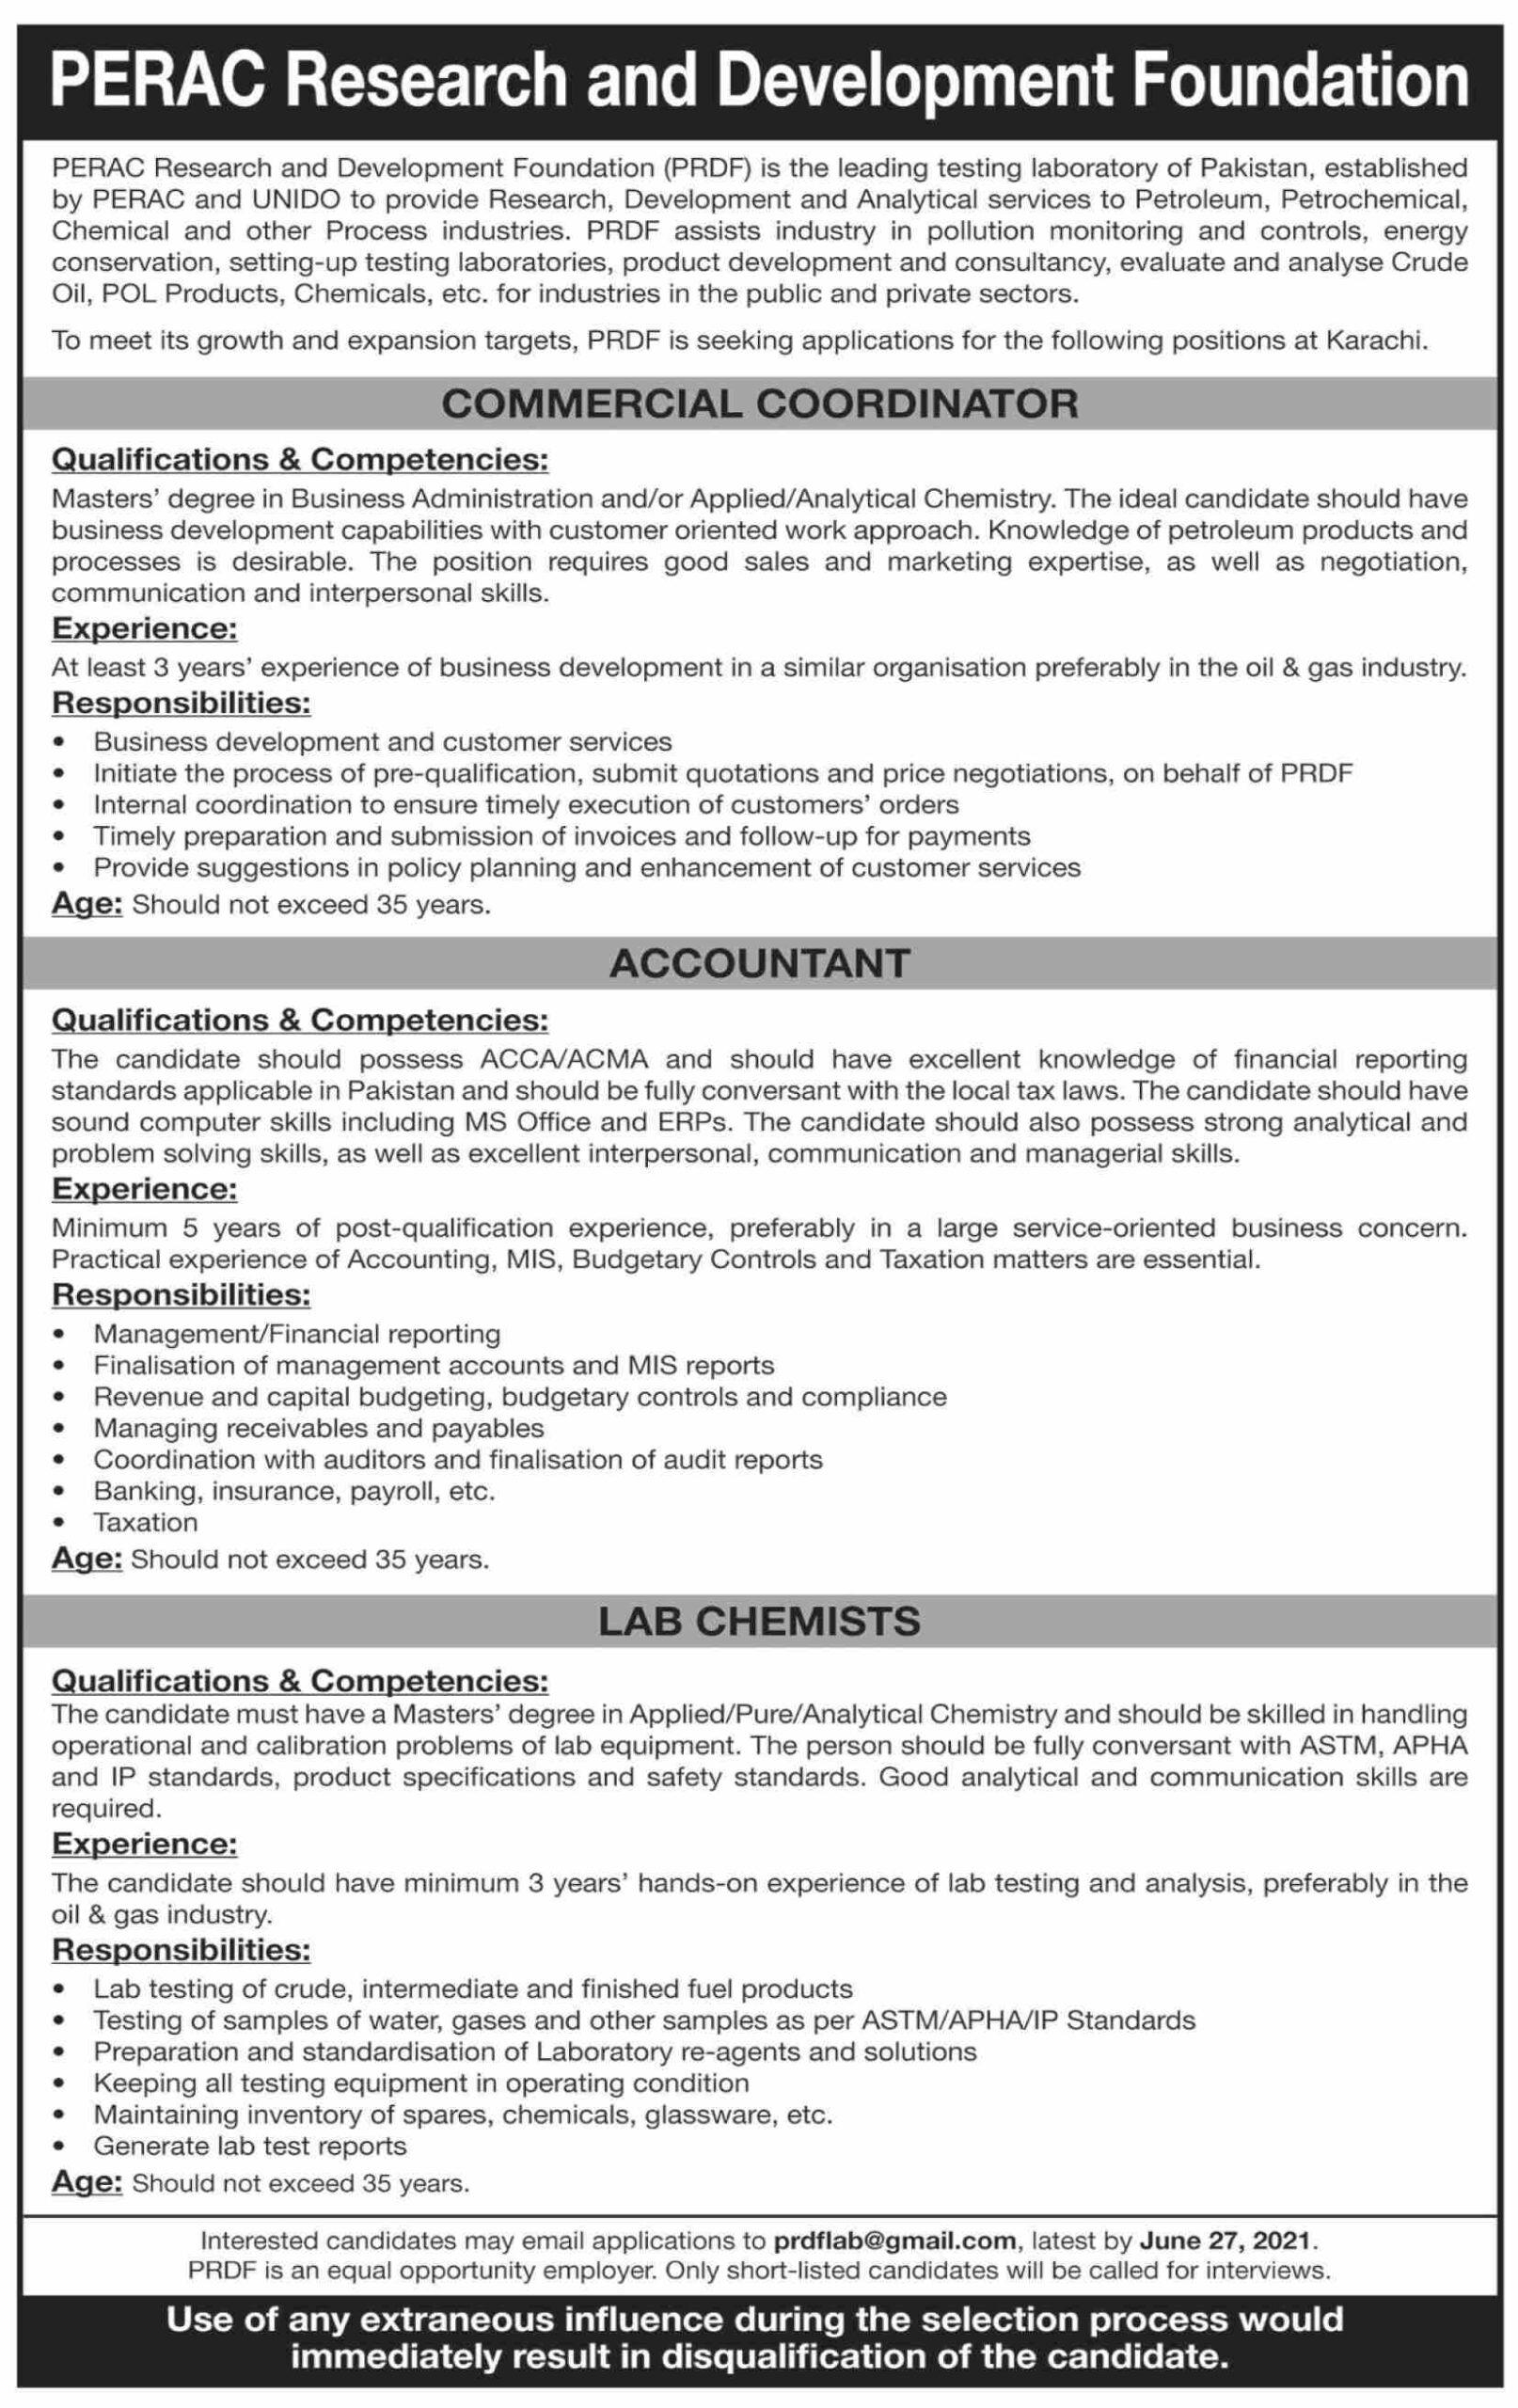 PRDF Jobs June 2021 PERAC Research and Development Foundation Job June 2021